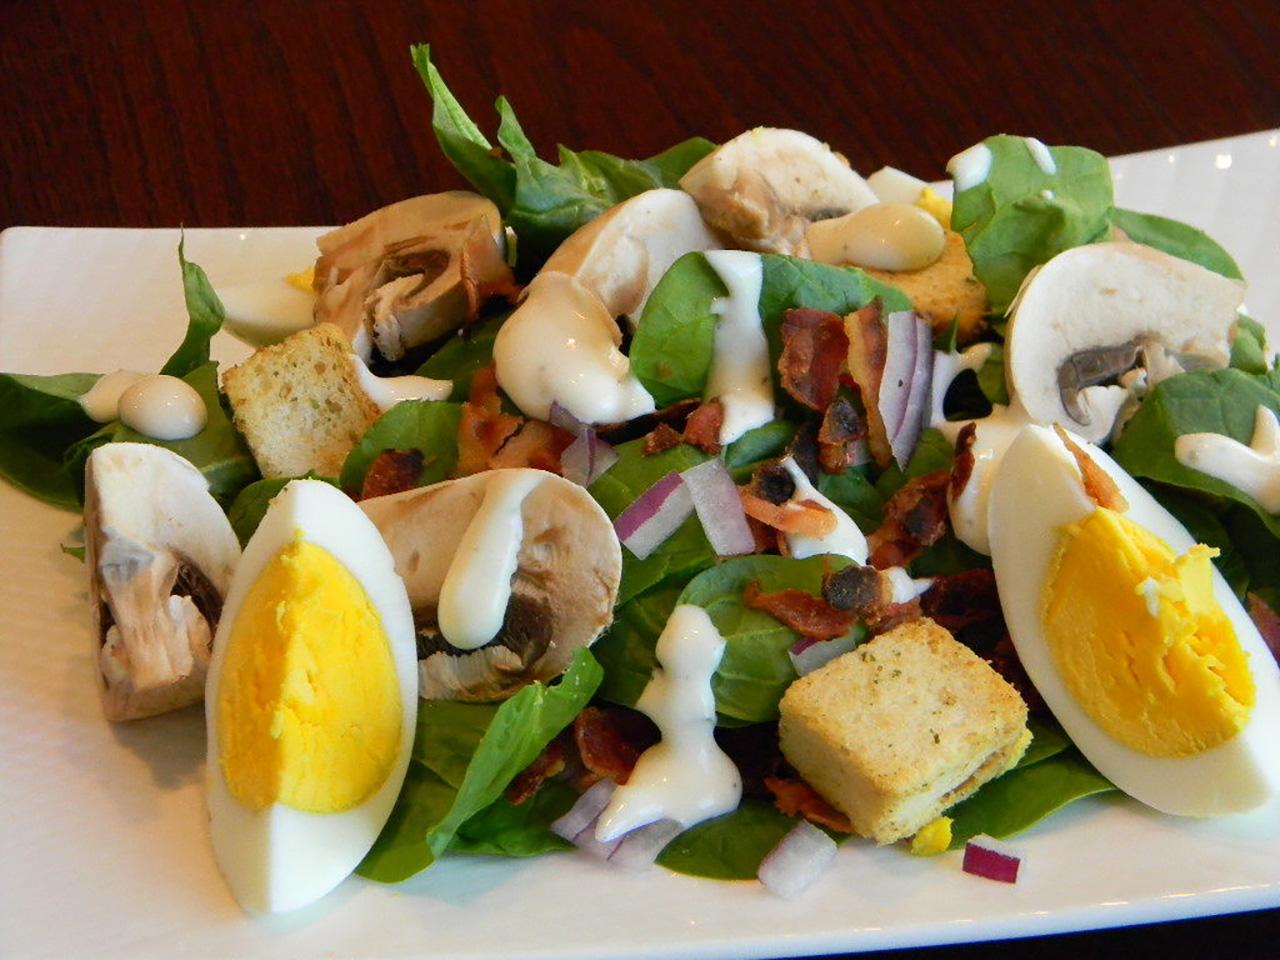 Spinach, Bacon, and Mushroom Salad